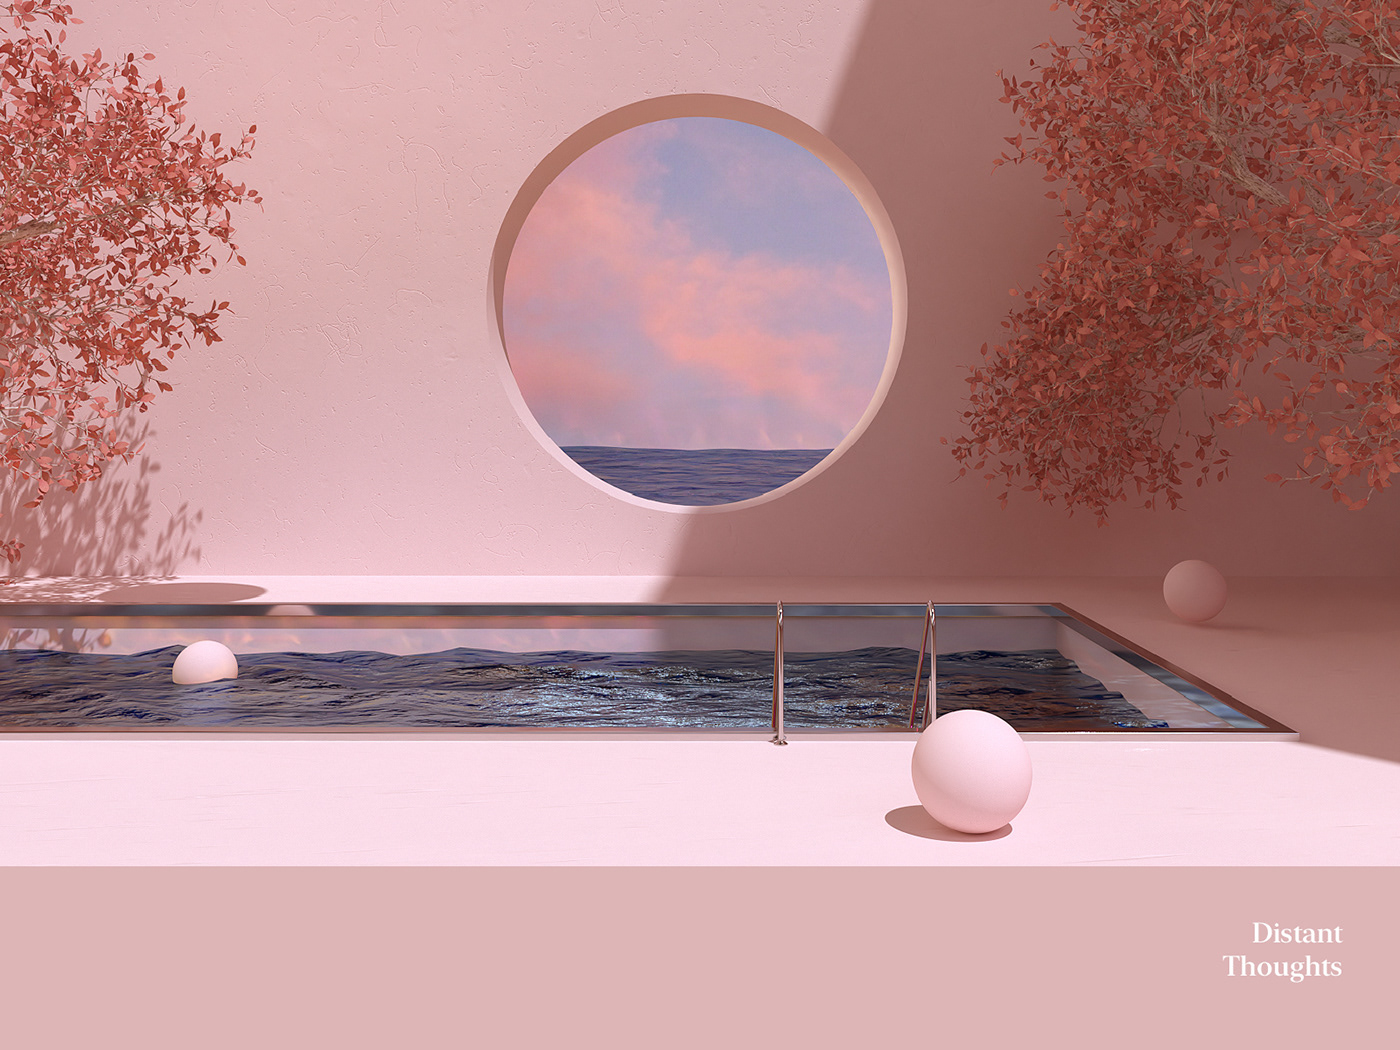 octane surreal surrealism art minimal poster fantasy